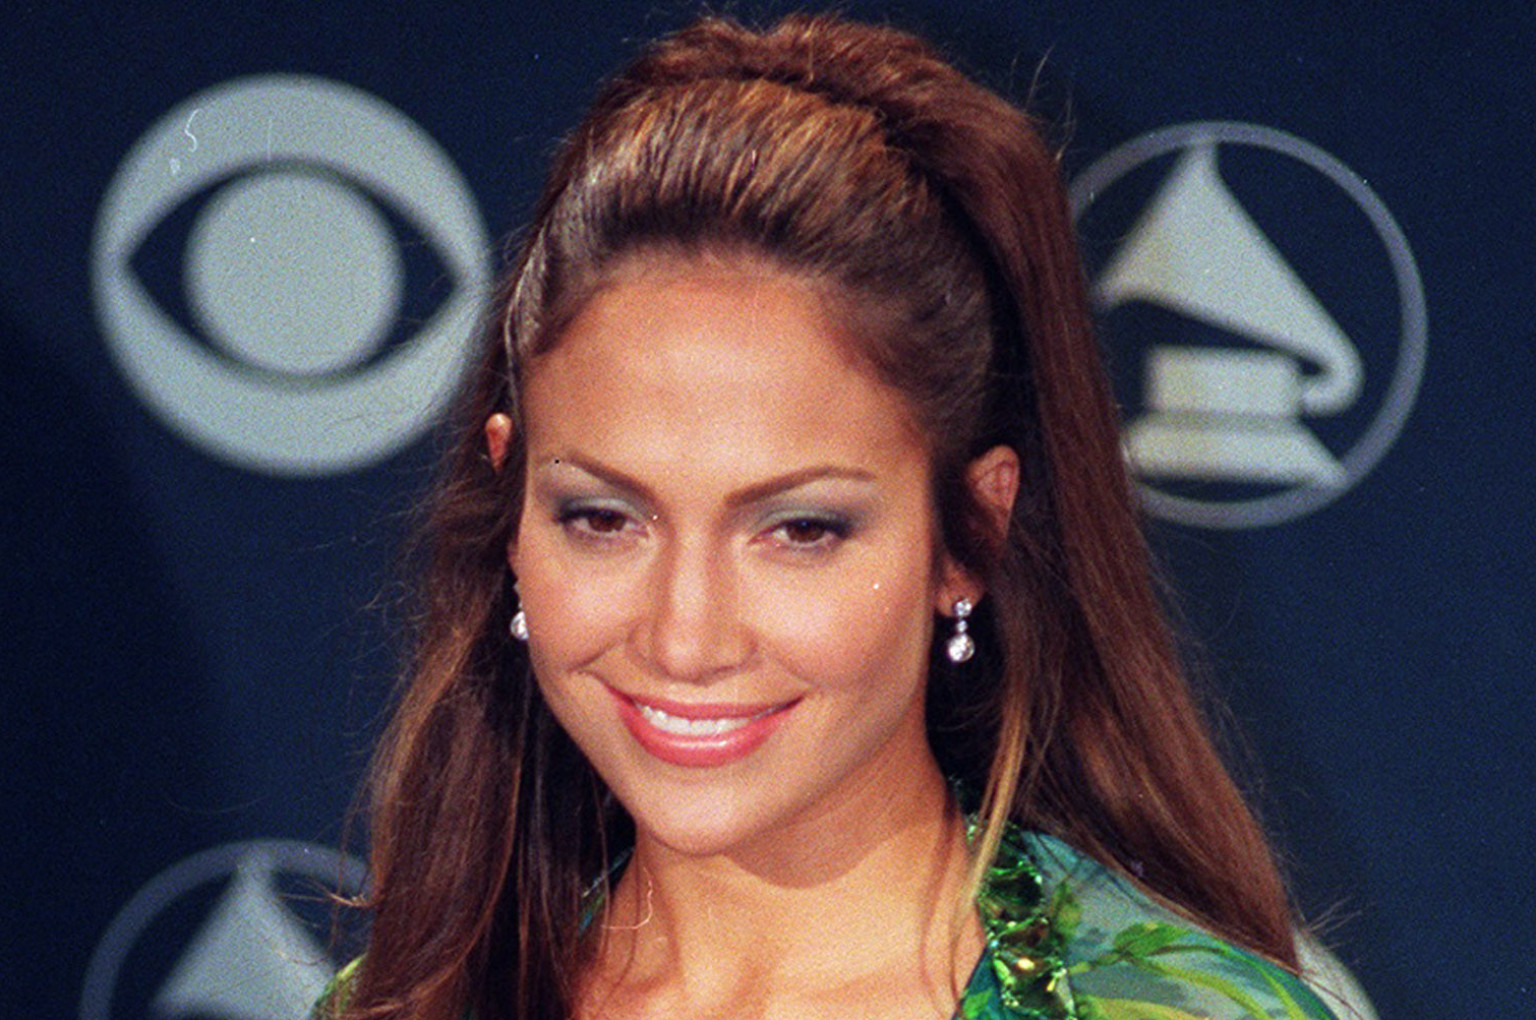 Jennifer Lopez On THAT Green Dress: 'What's The Big Deal?!' (PHOTOS) Jennifer Lopez